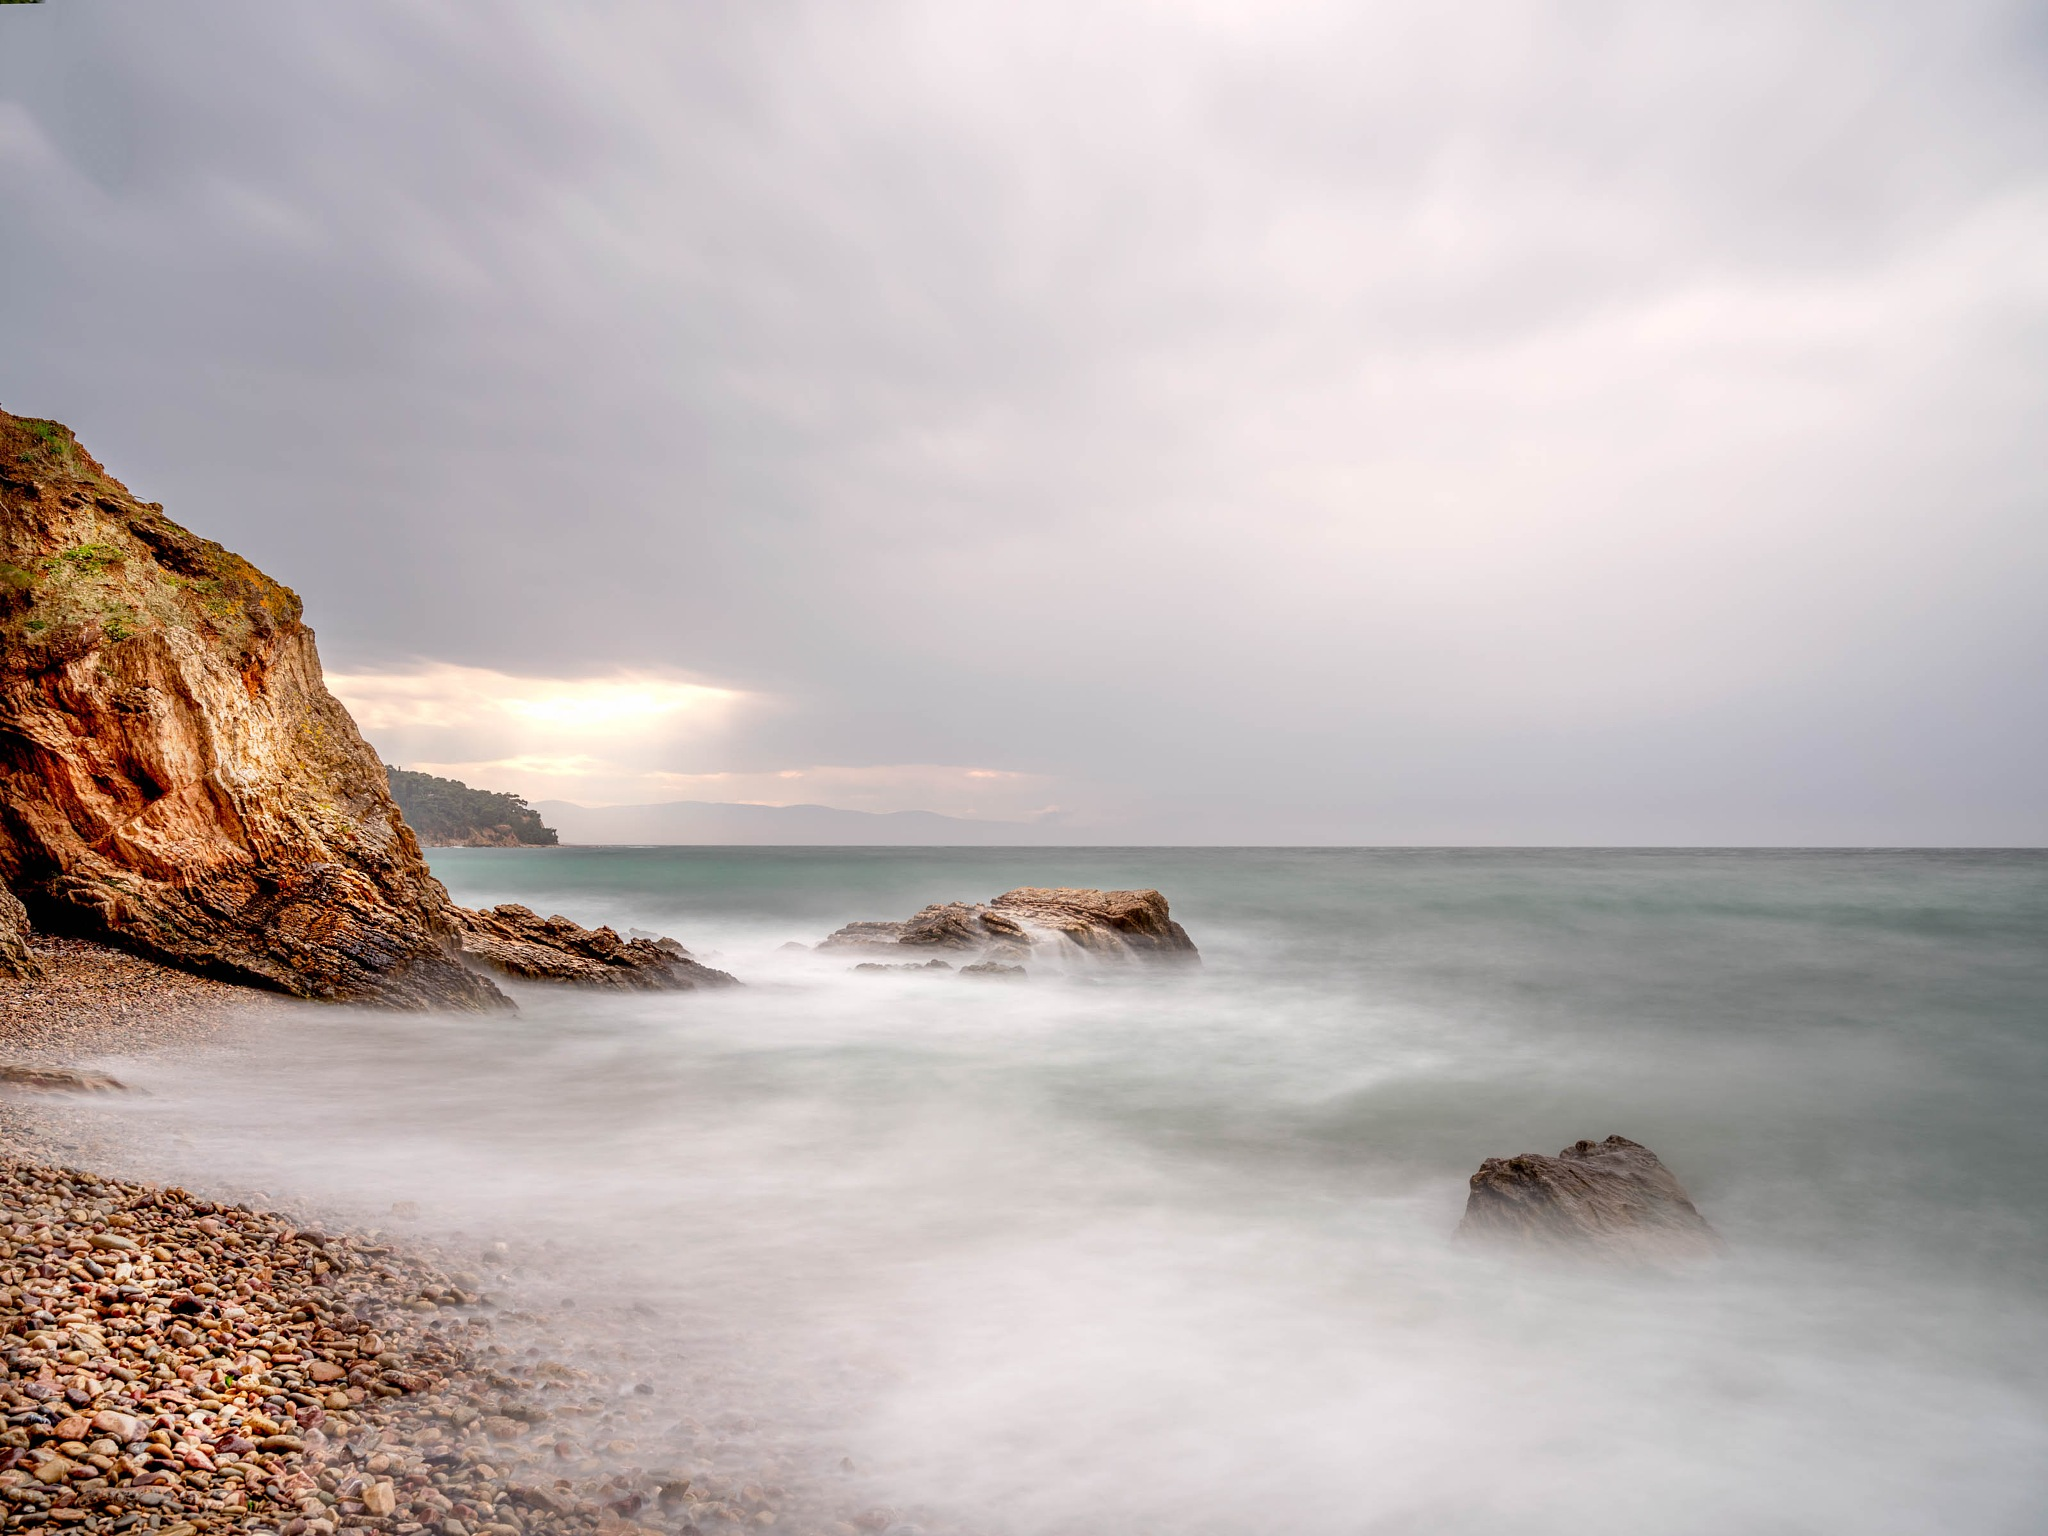 Misty Sea by cenk sarvan